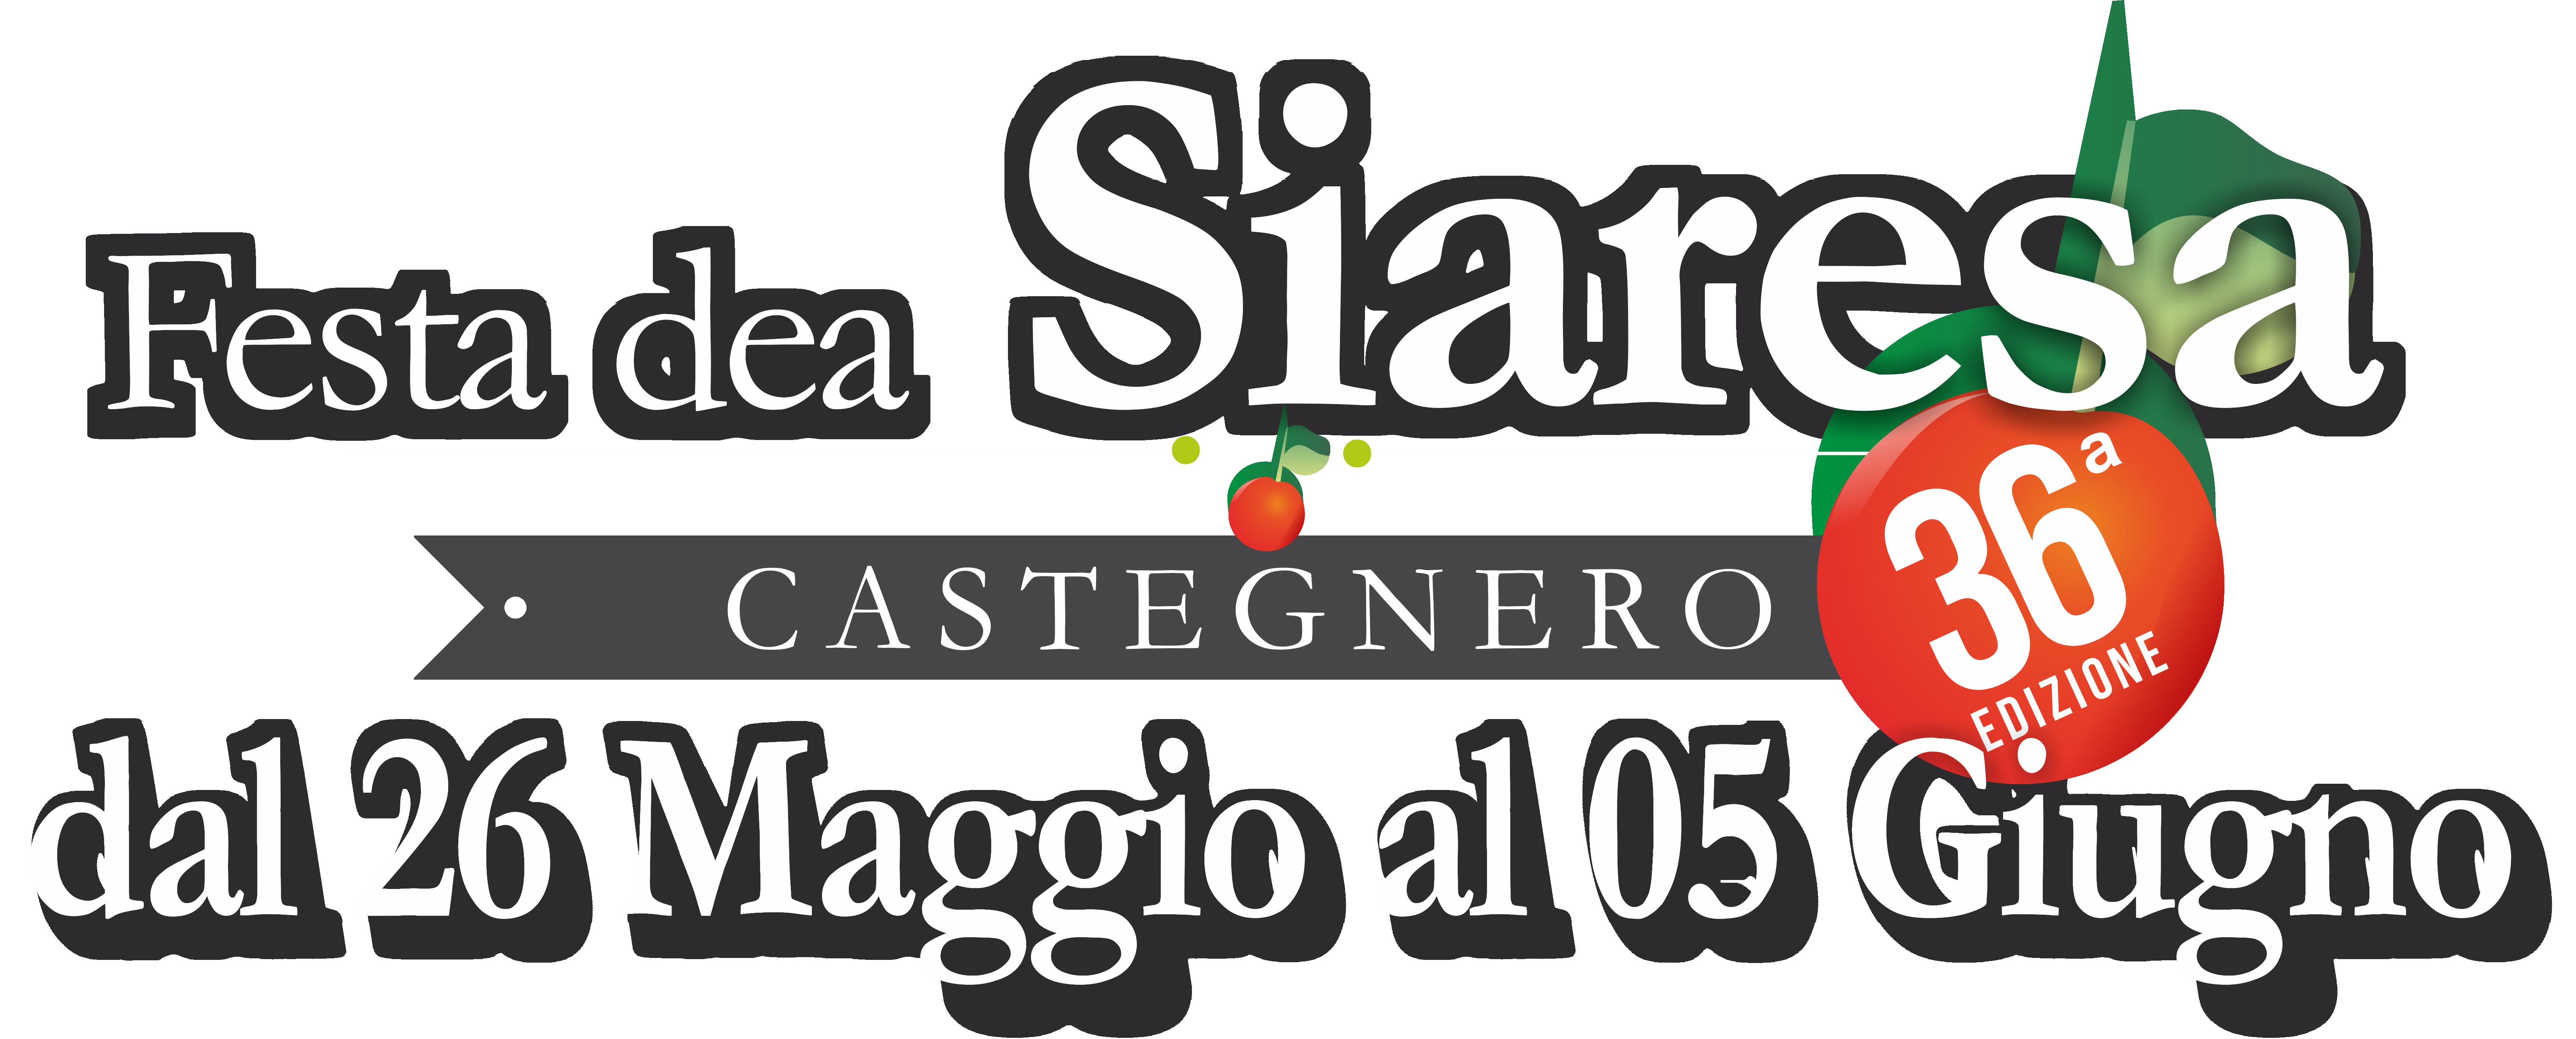 Festa dea Siaresa Castegnero (Vicenza)